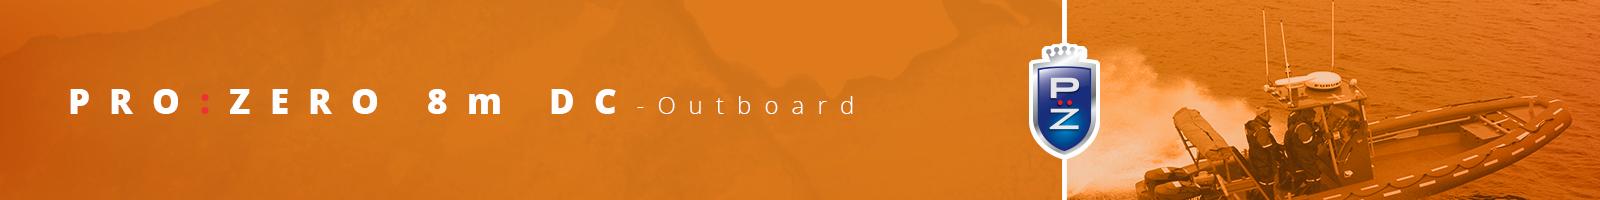 Workboats 7m FRB Product Header.jpg